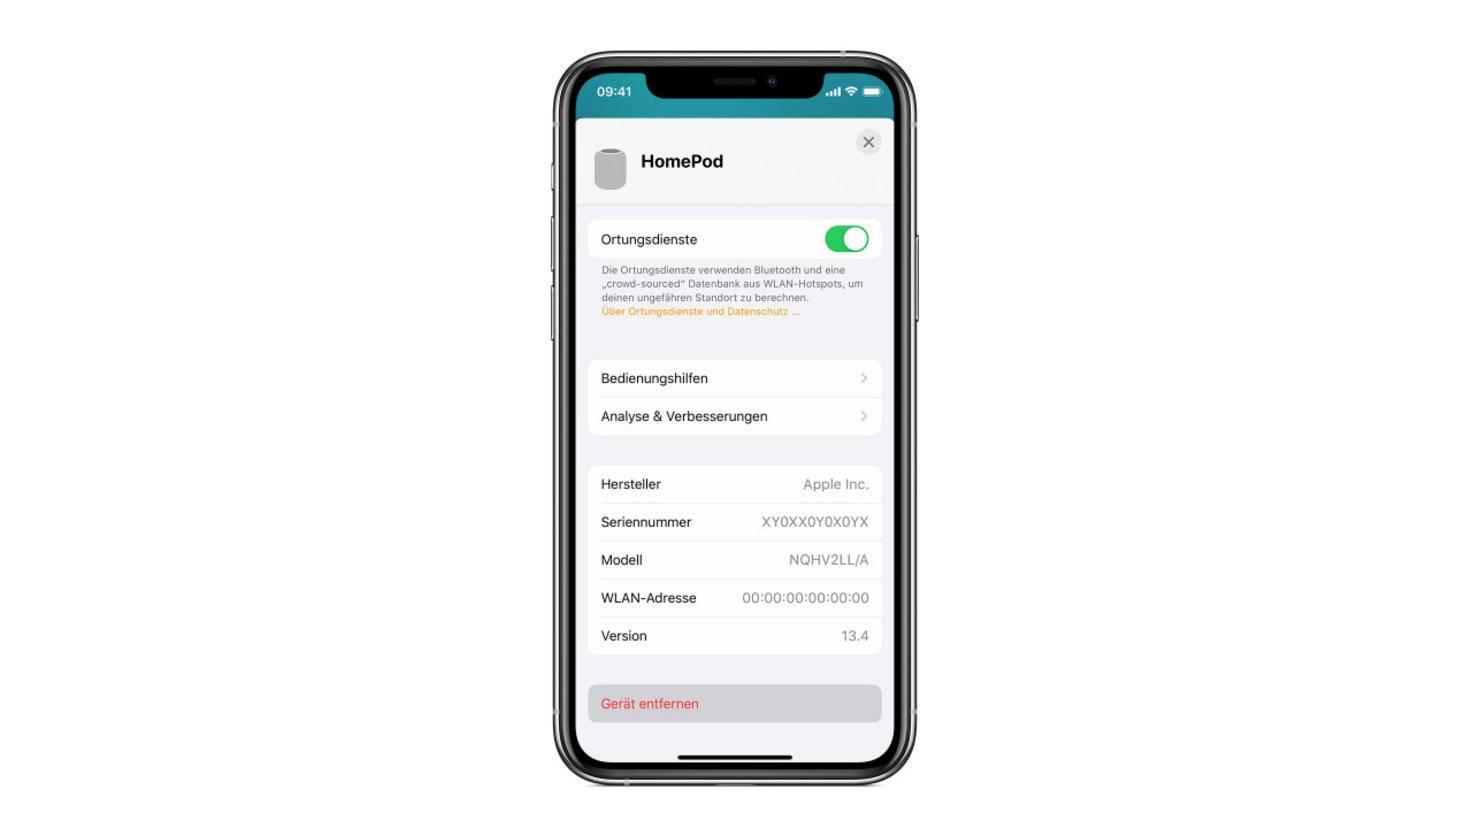 apple-homepod-zurücksetzen-iphone-screenshot